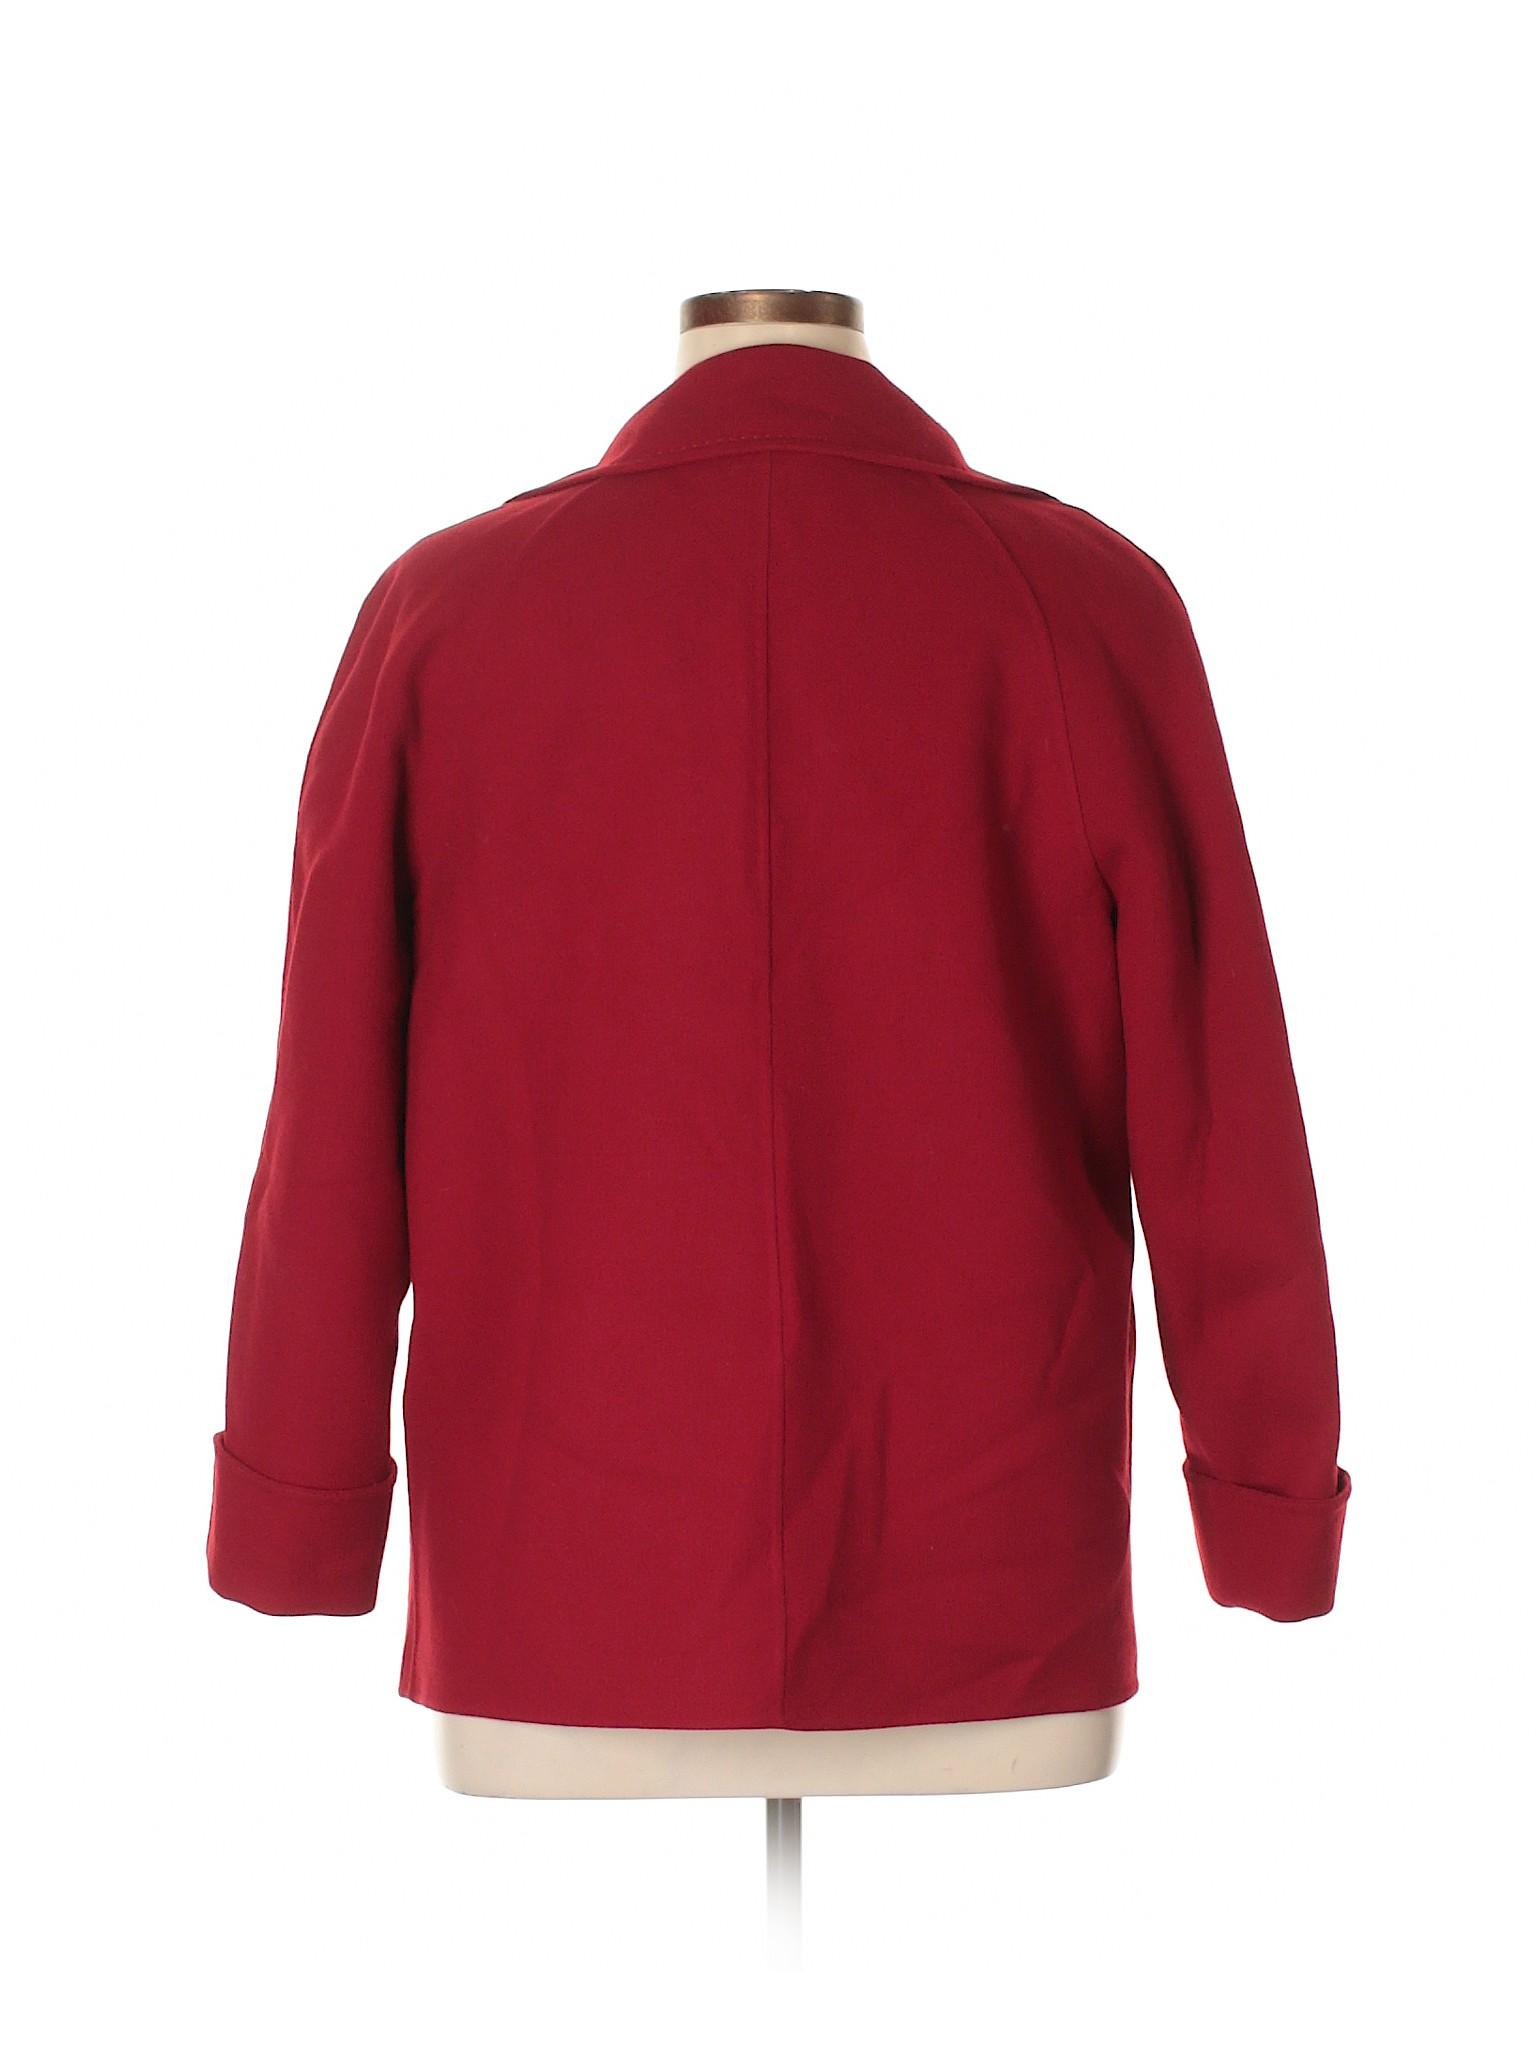 Coat Talbots Wool Wool Boutique Talbots Boutique Boutique Coat Talbots waxfq6Bga